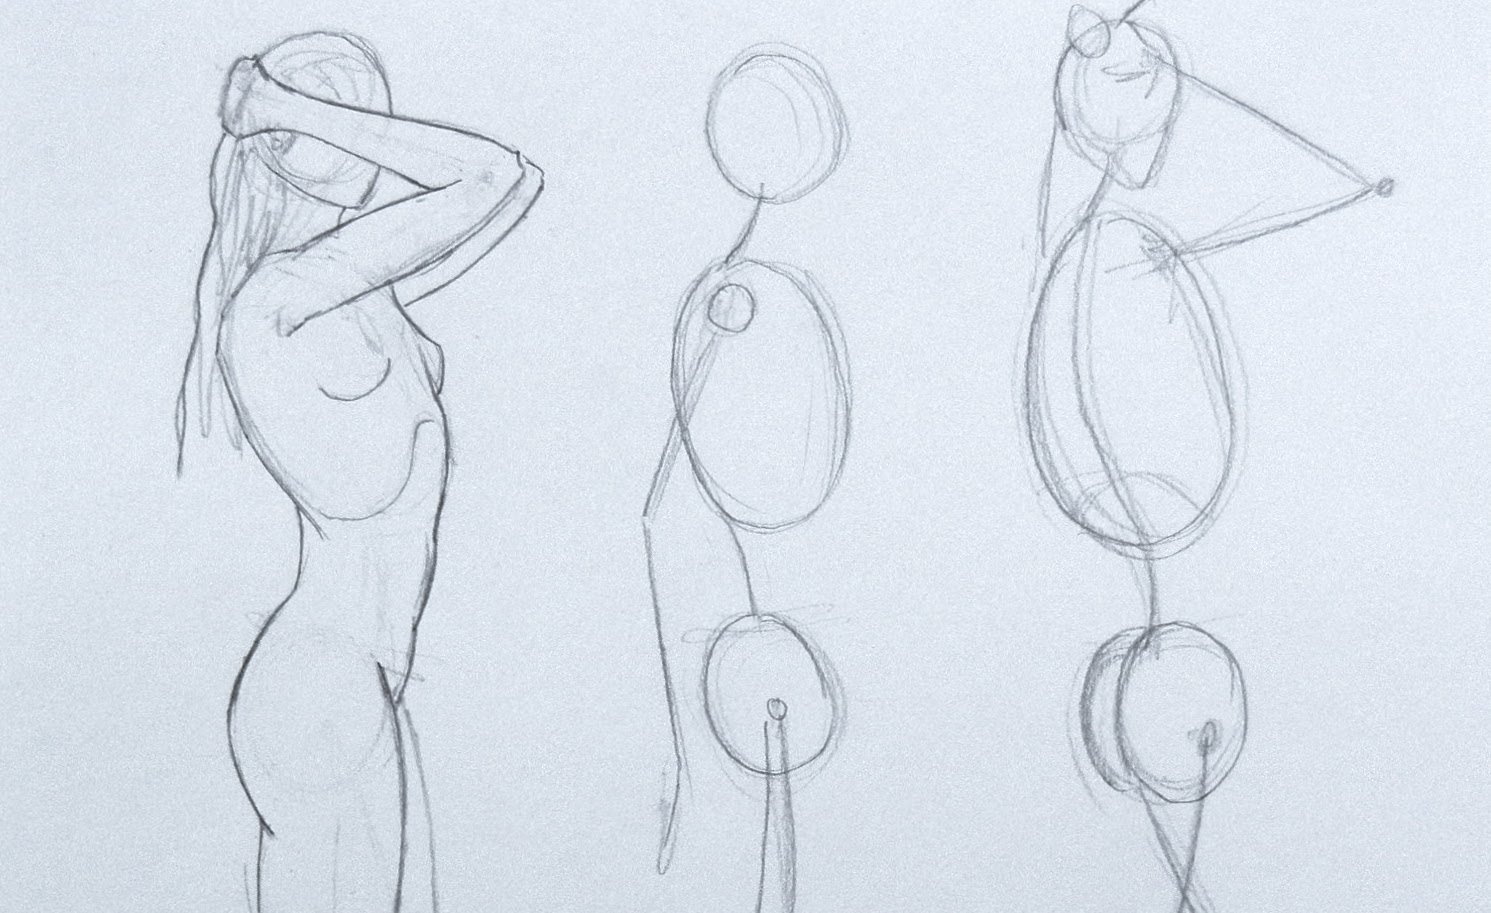 How to Draw the Figure From the Imagination Leonardo Pereznieto